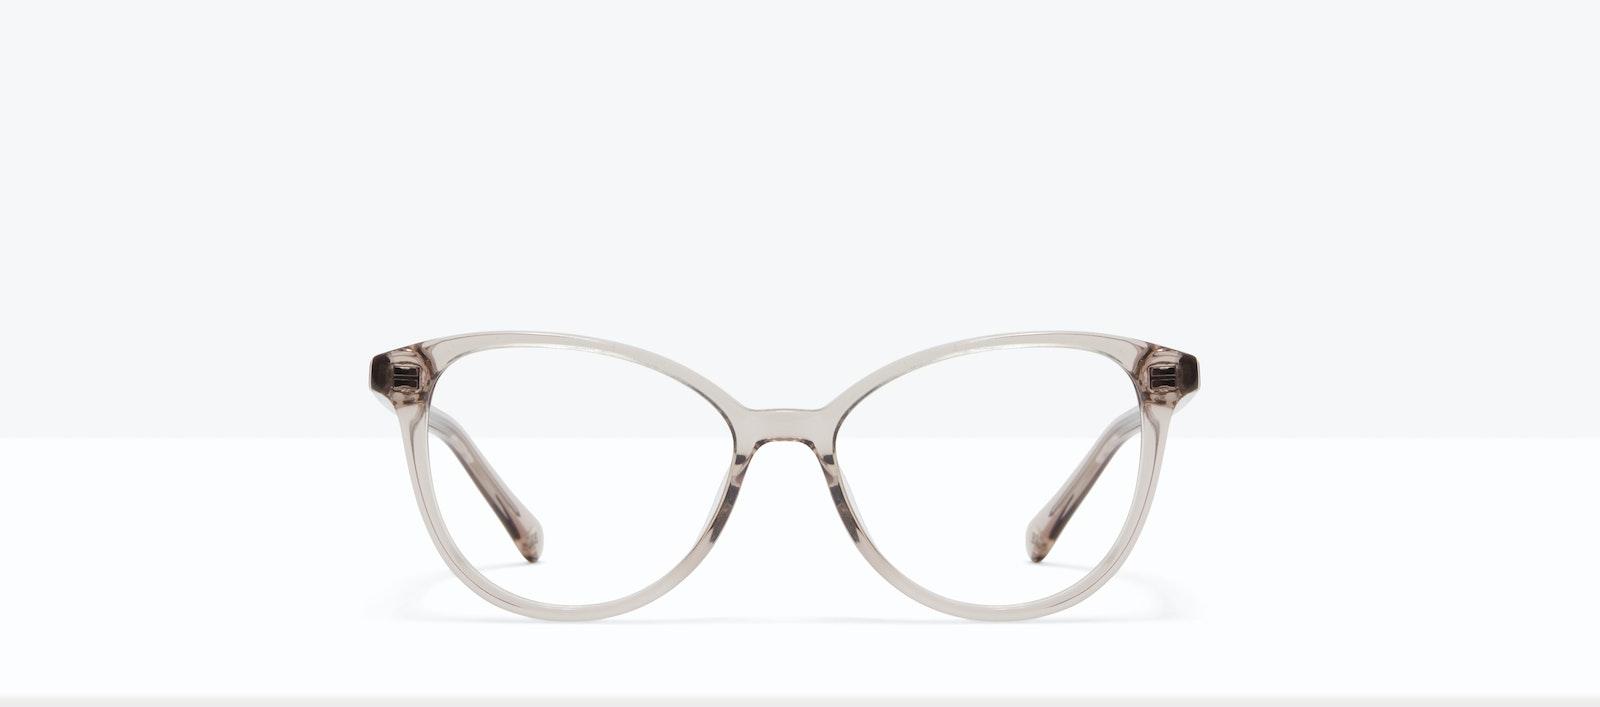 Affordable Fashion Glasses Cat Eye Eyeglasses Women Esprit L Sand Front